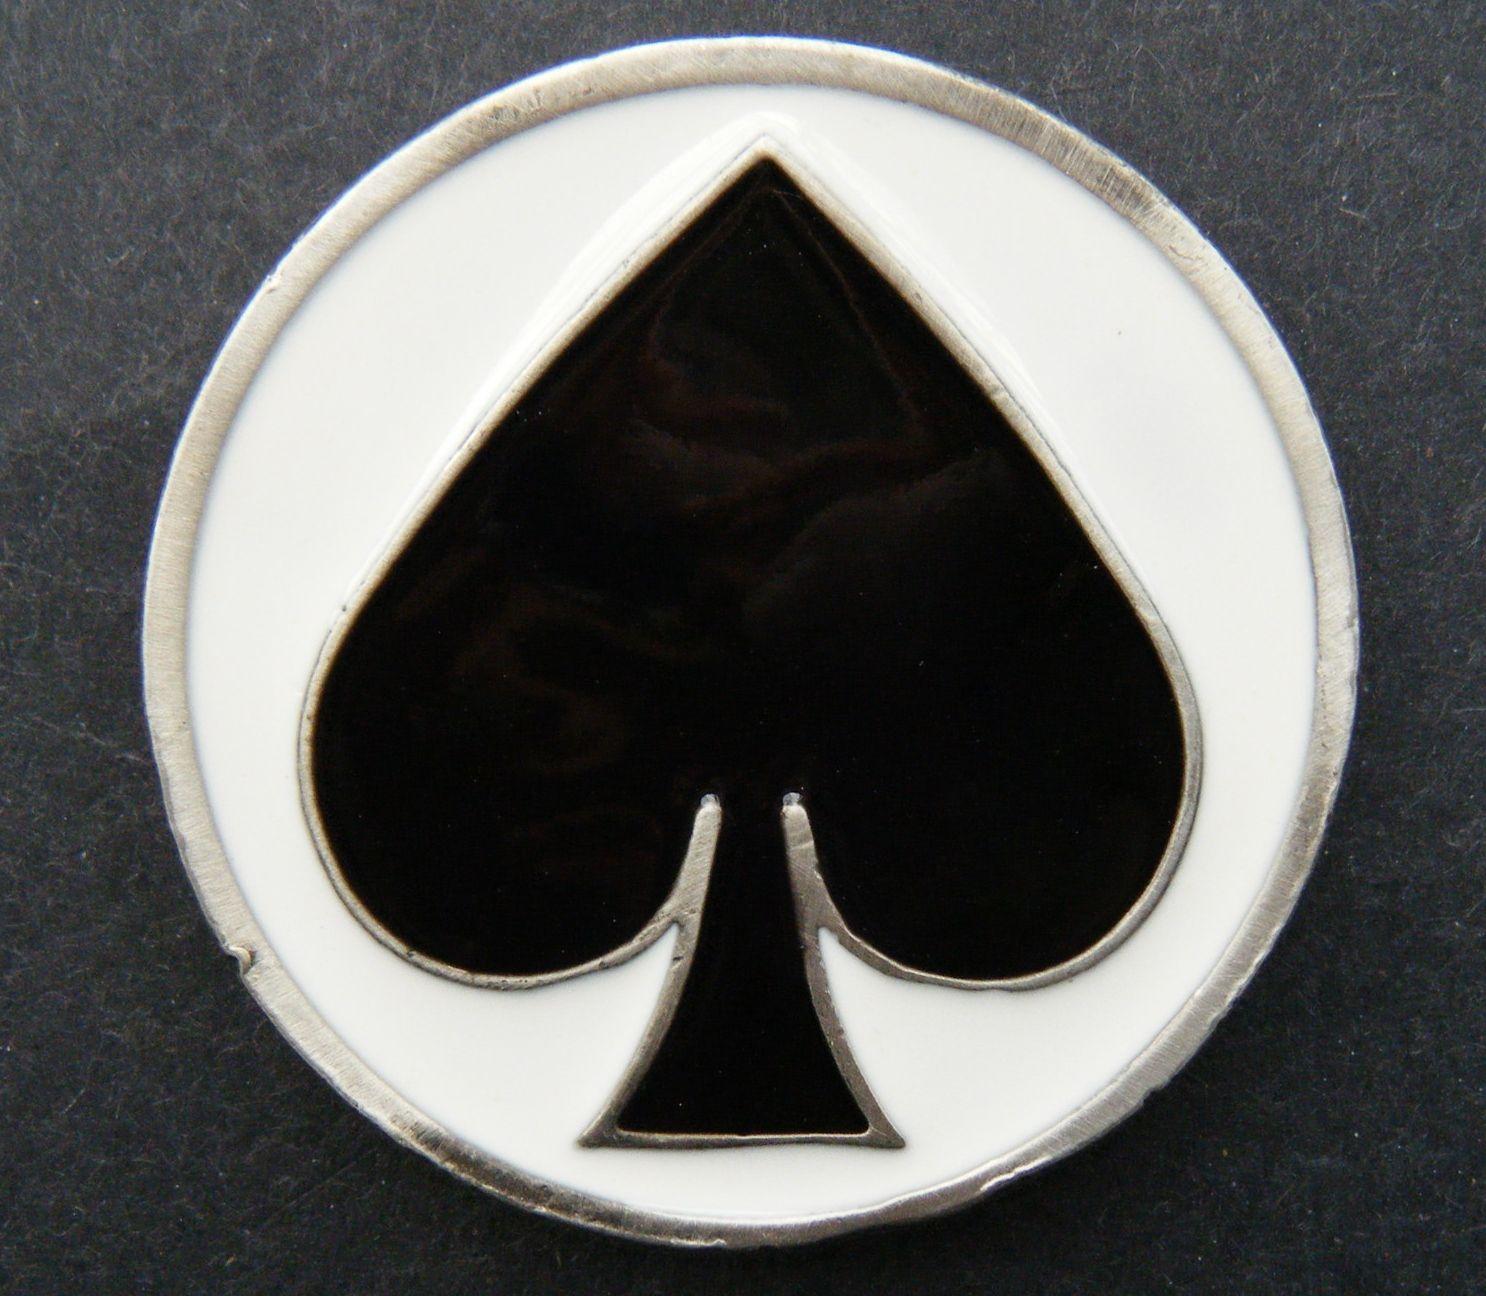 Ace Spades Belt Buckle Gambling Casino Poker Card Game Casual Cool Metal Buckles #spades #blackspades #spadesbeltbuckle #spadesbuckle  Beltbuckle #buckles #cards #deckofcards